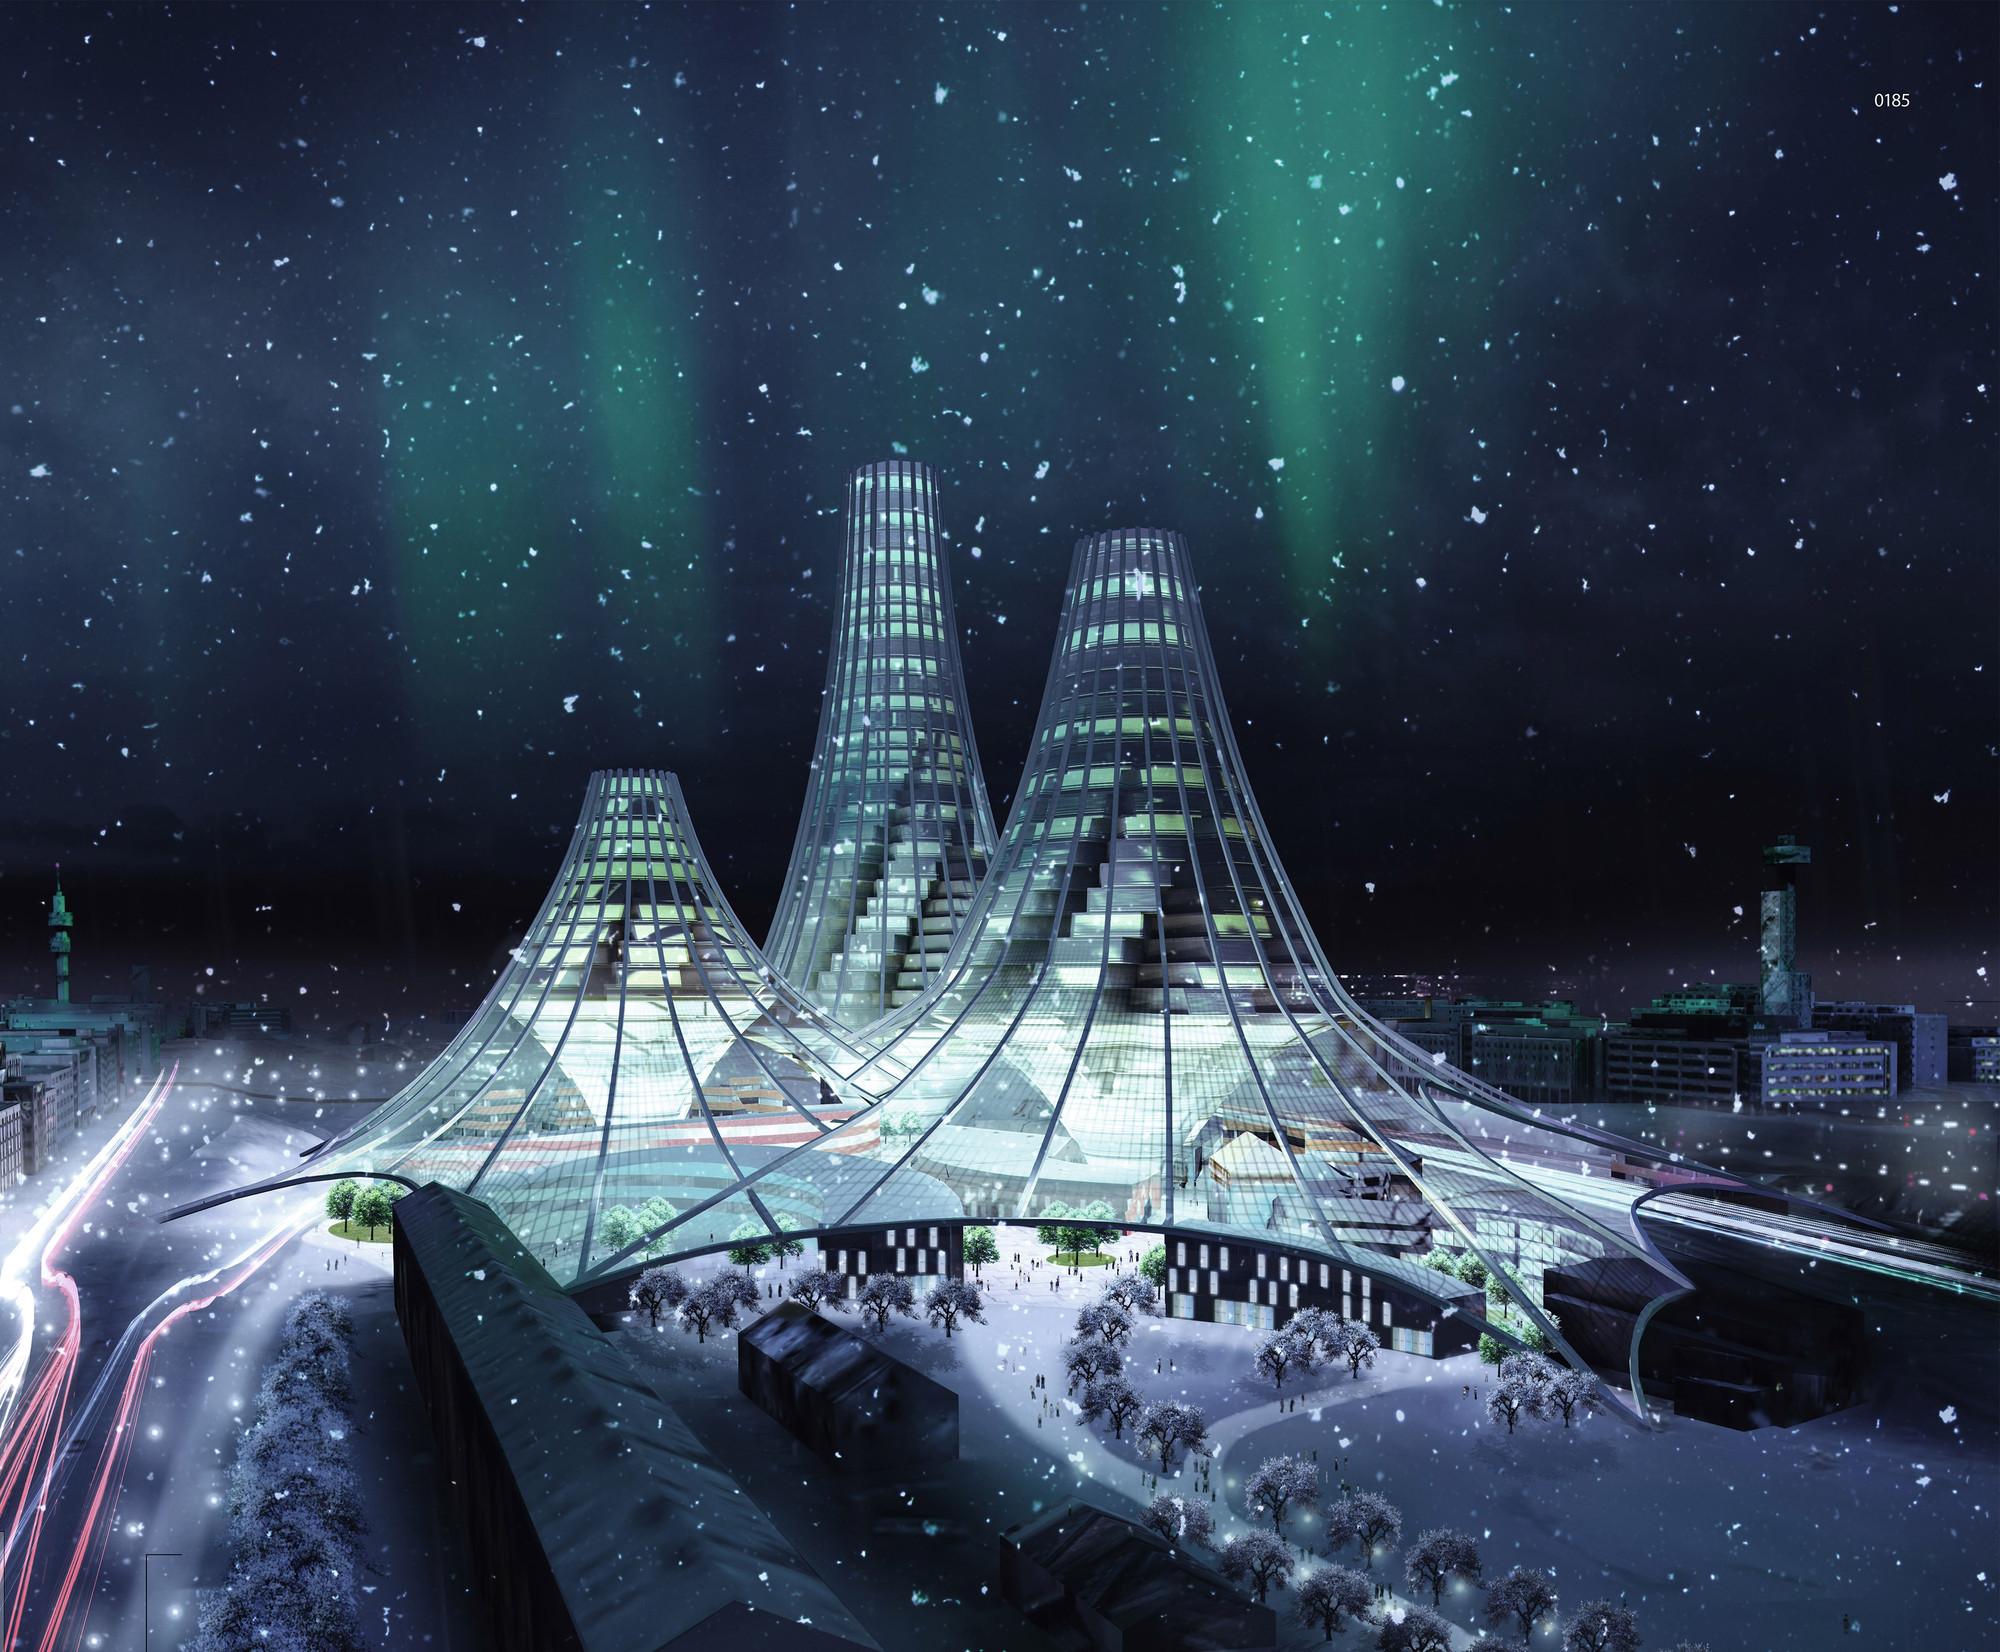 Re2iffel Equalizer Skyscraper / Teemu Holopainen, Tomi Jaskari, Tuomas Vuorinen, Simon Ornberg. Imagen cortesía de eVolo